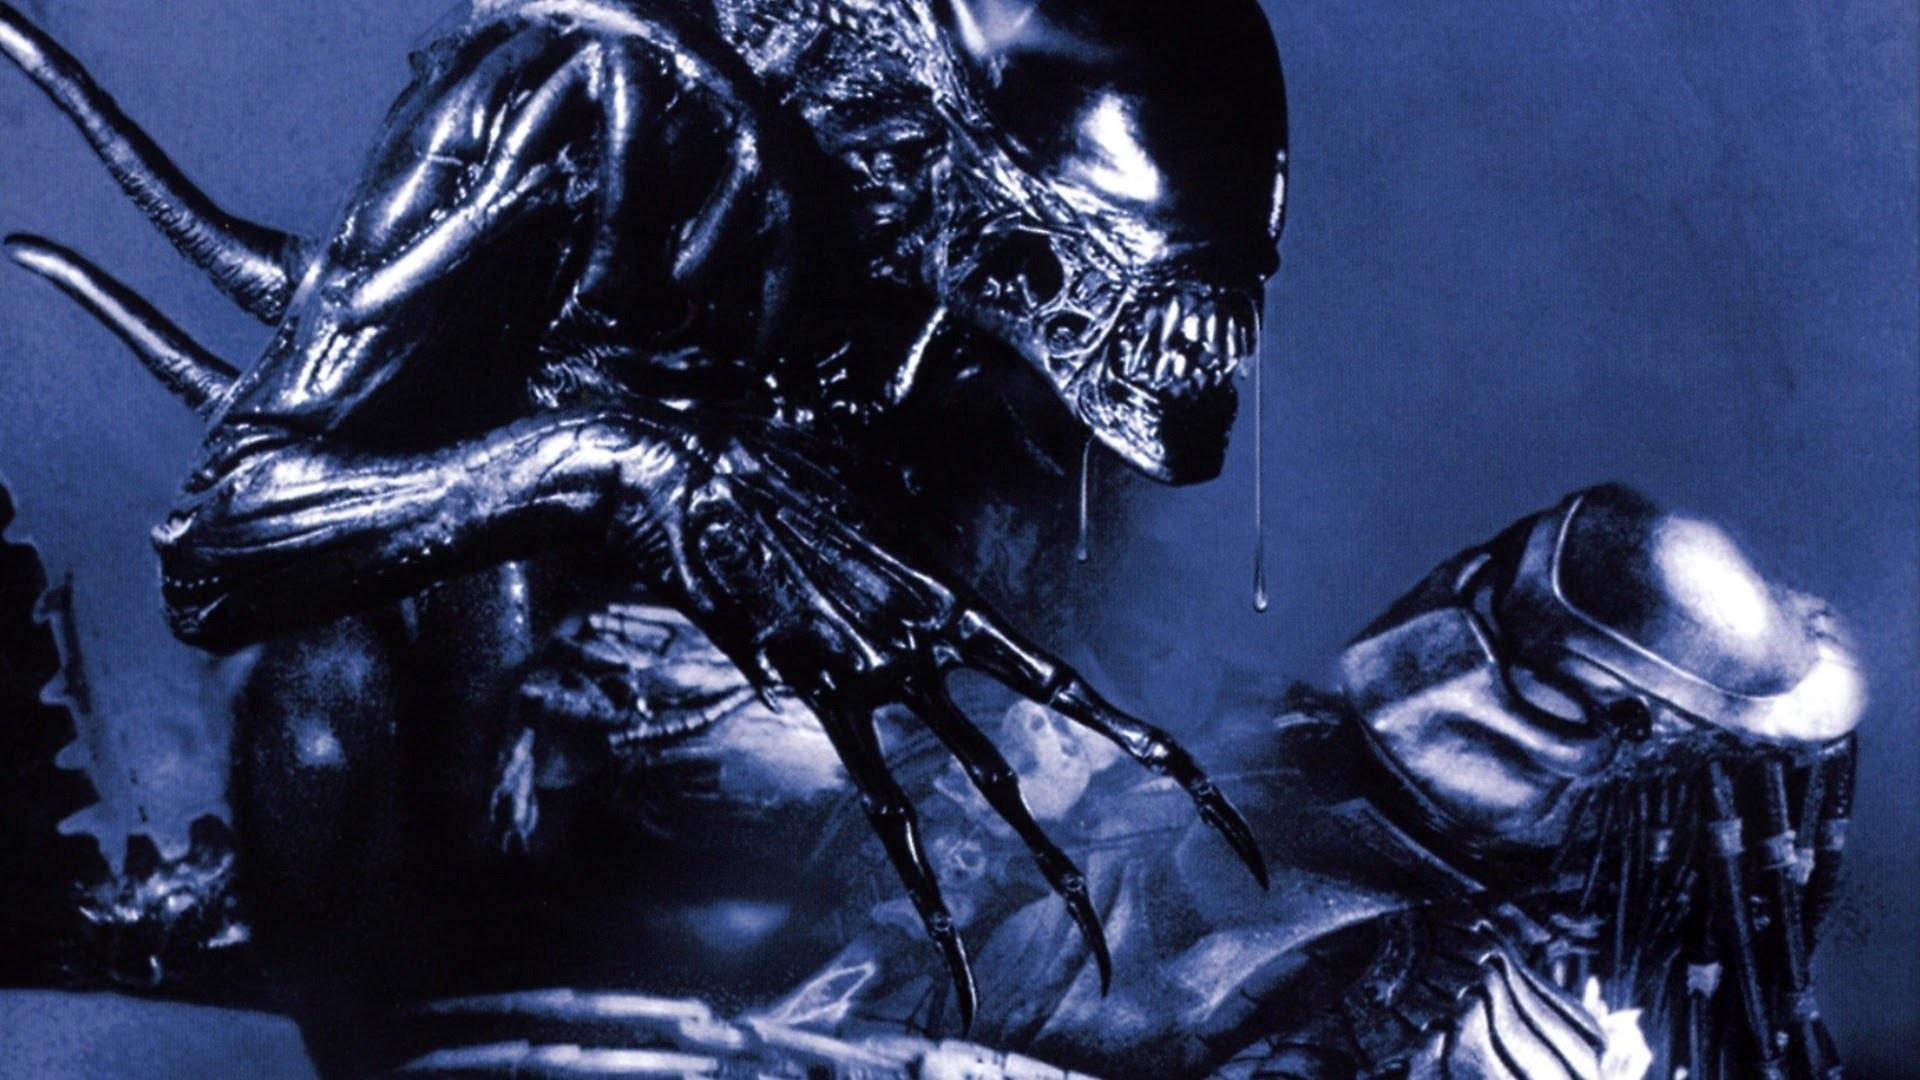 gmod alien vs predator player battle